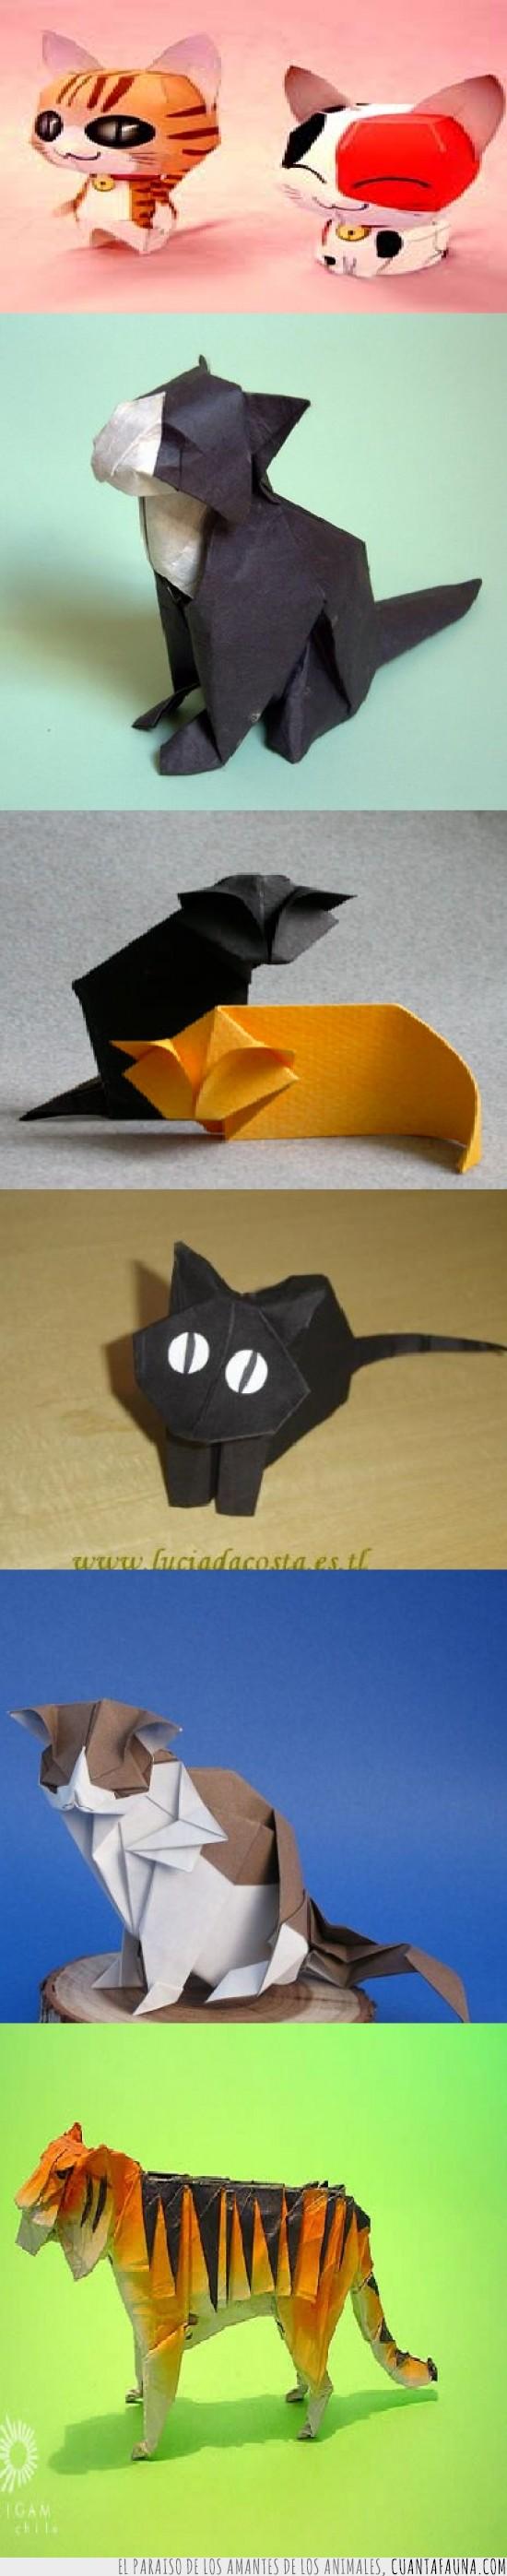 felinos,gatos,origami,papel,papiroflexia,tigre